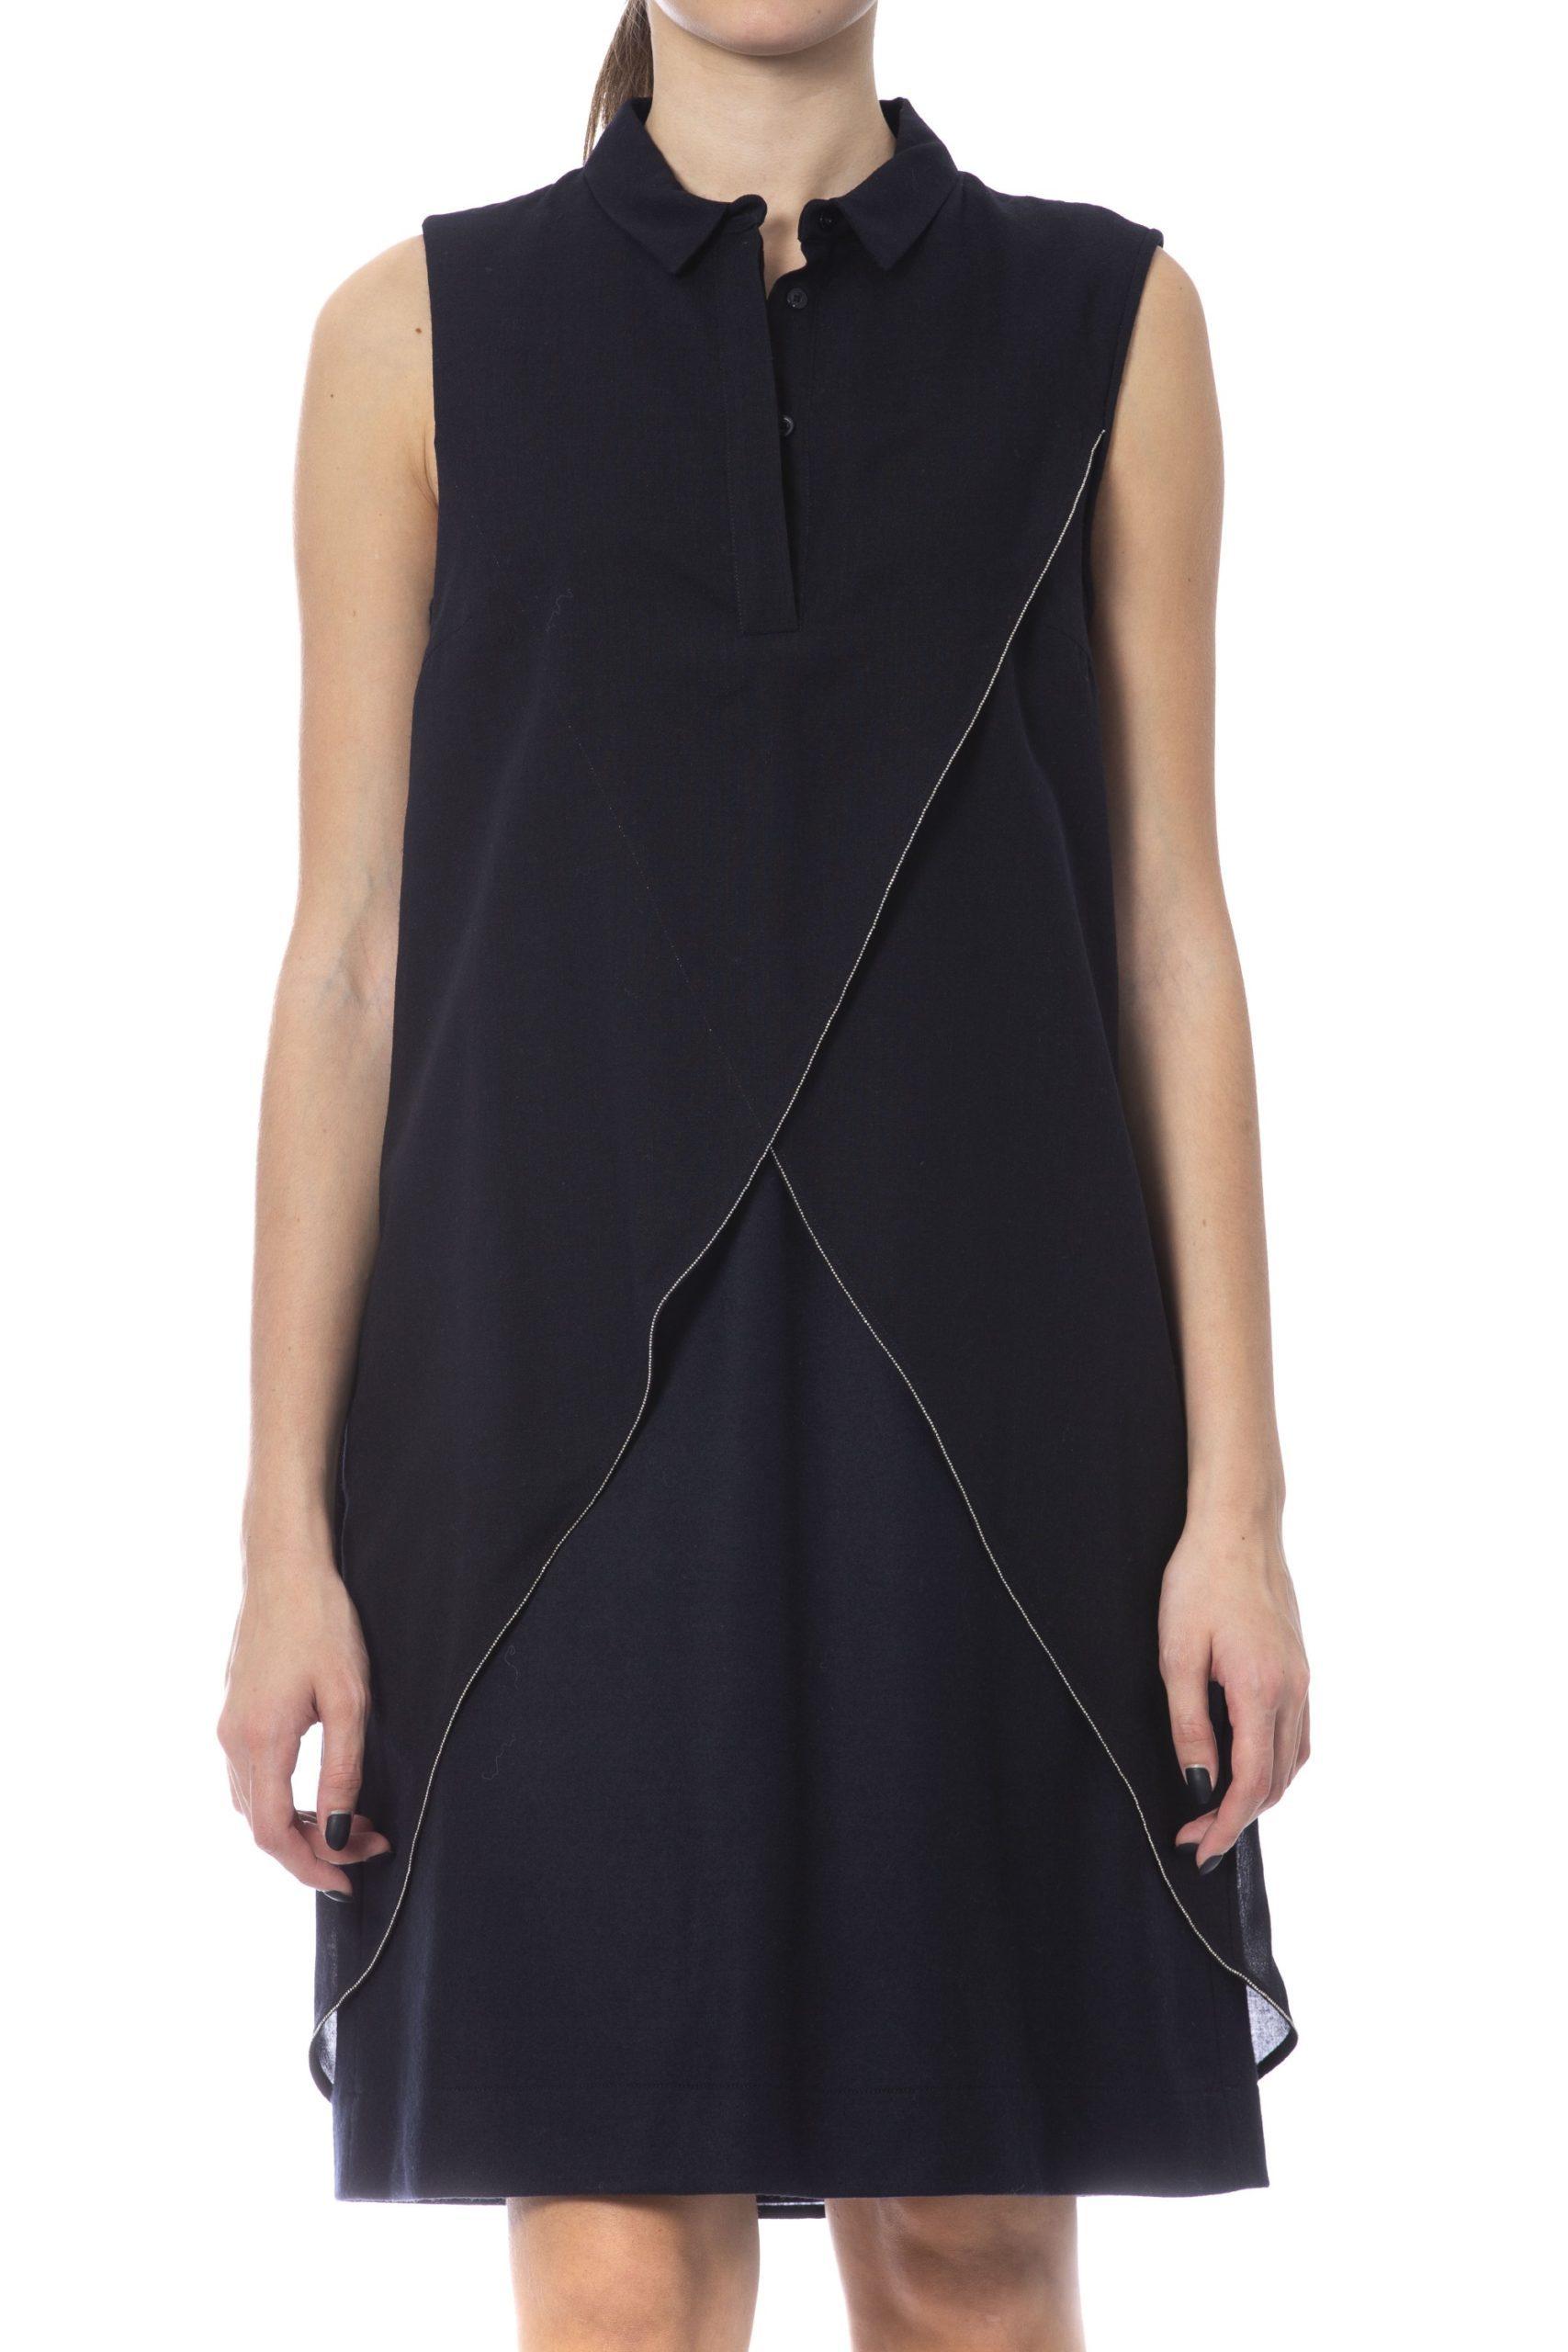 Peserico Women's Dress Black PE993654 - IT42 | S